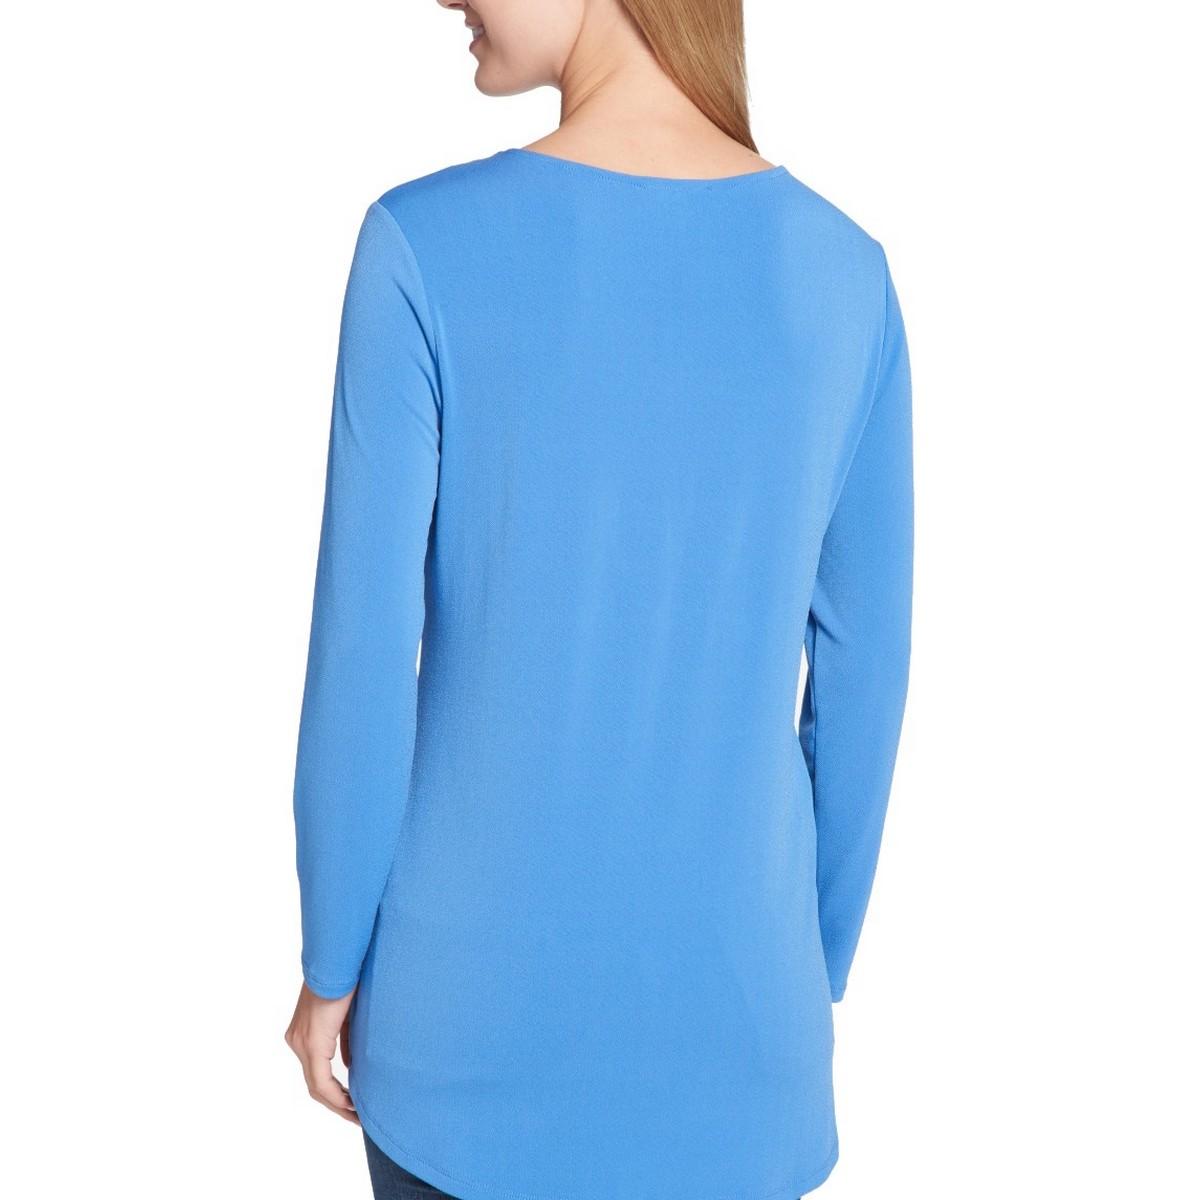 TOMMY-HILFIGER-NEW-Women-039-s-Long-Sleeve-Keyhole-Blouse-Shirt-Top-TEDO thumbnail 6